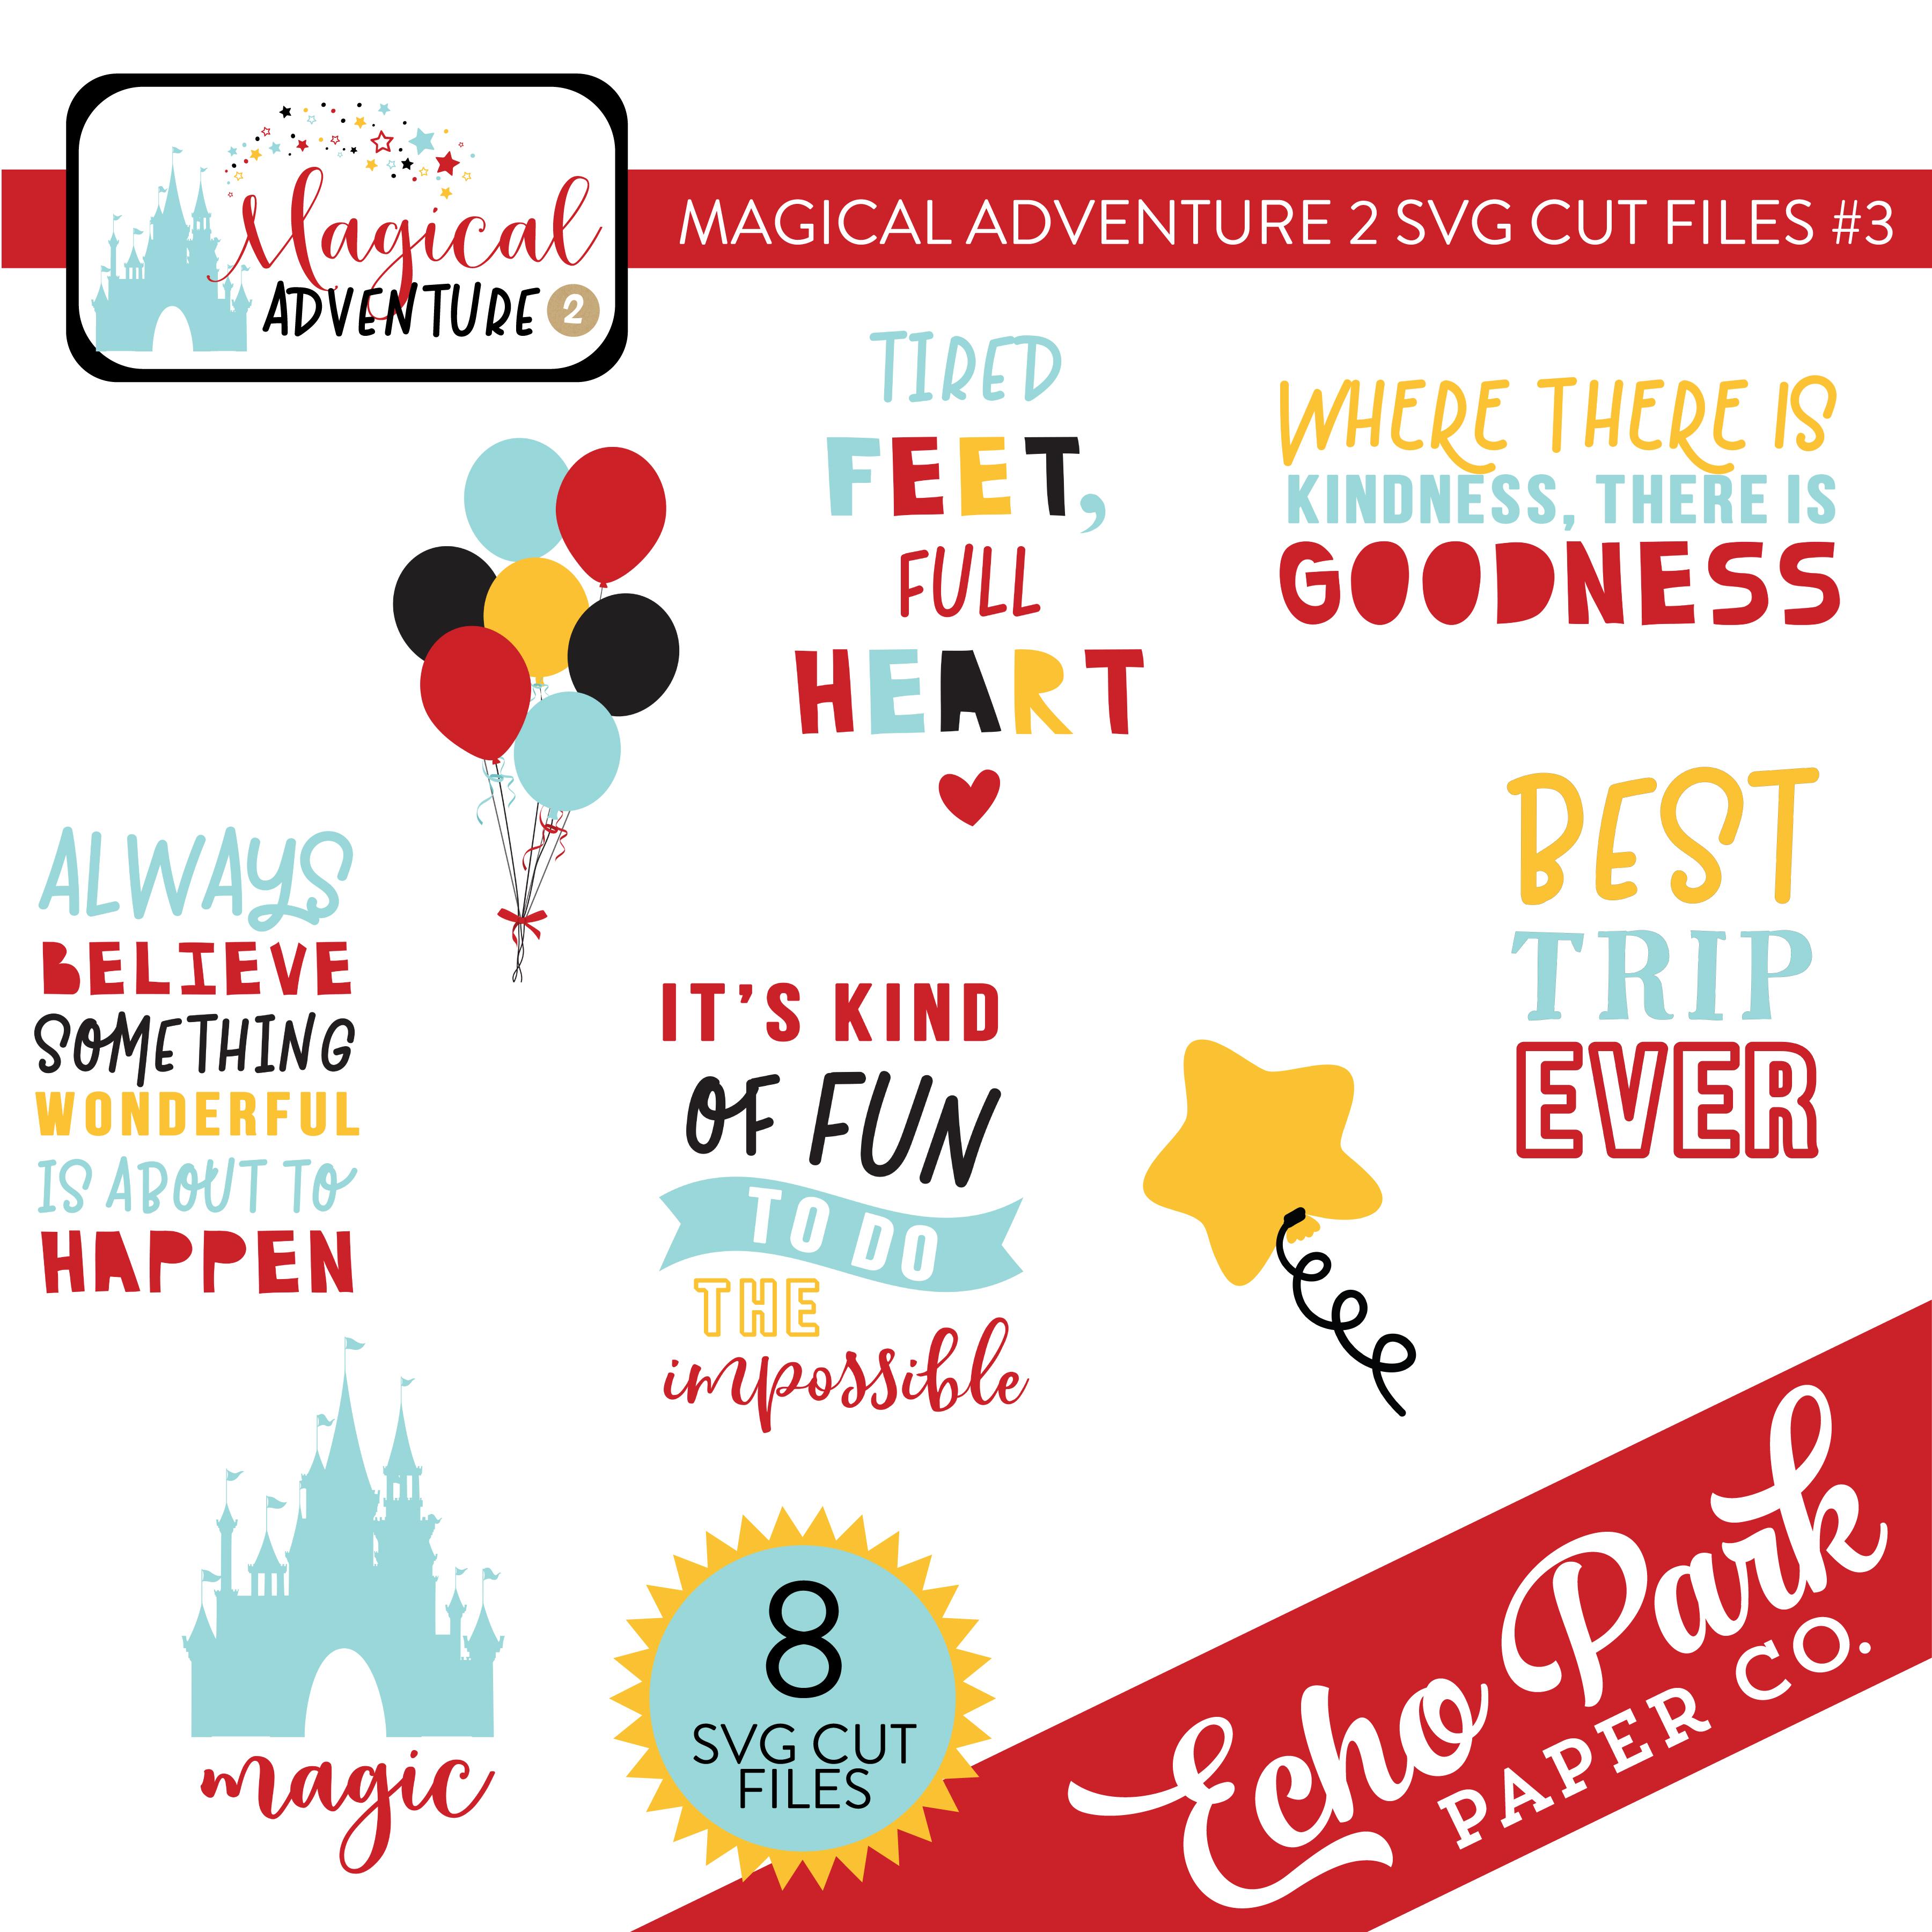 Magical Adventure 2 SVG Cut Files #3